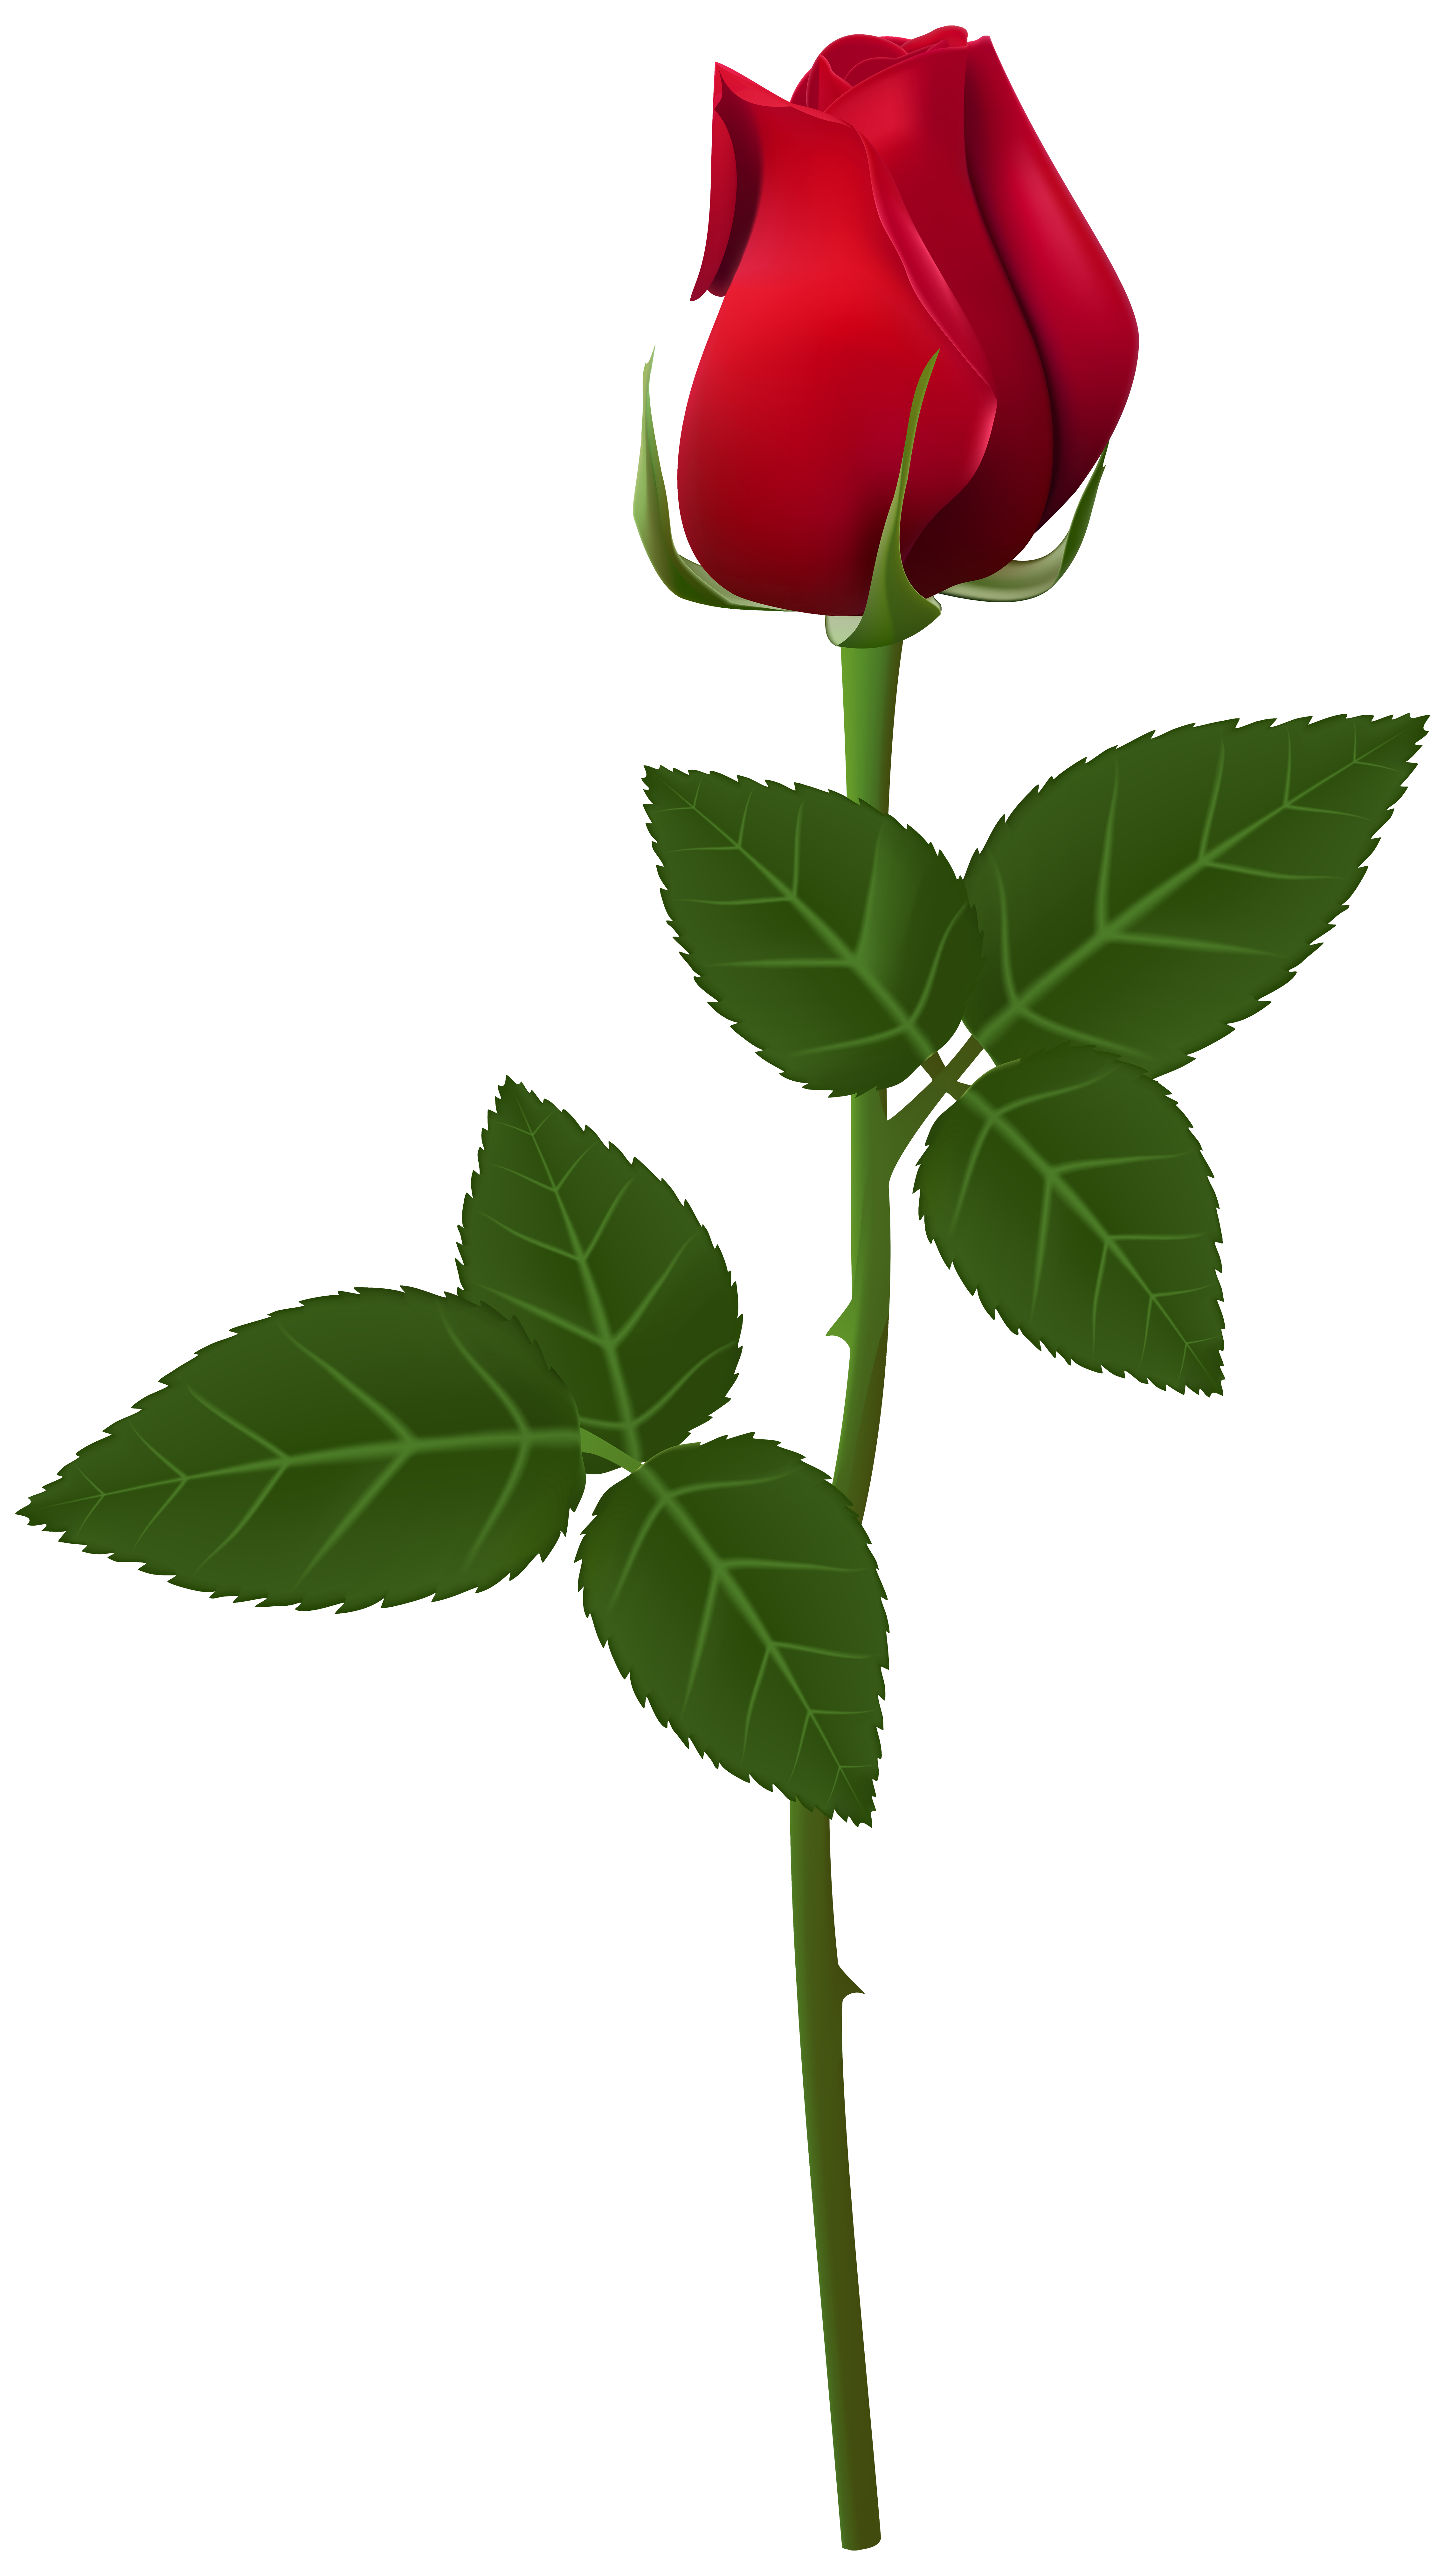 Rose clip art image. Transparent png images roses